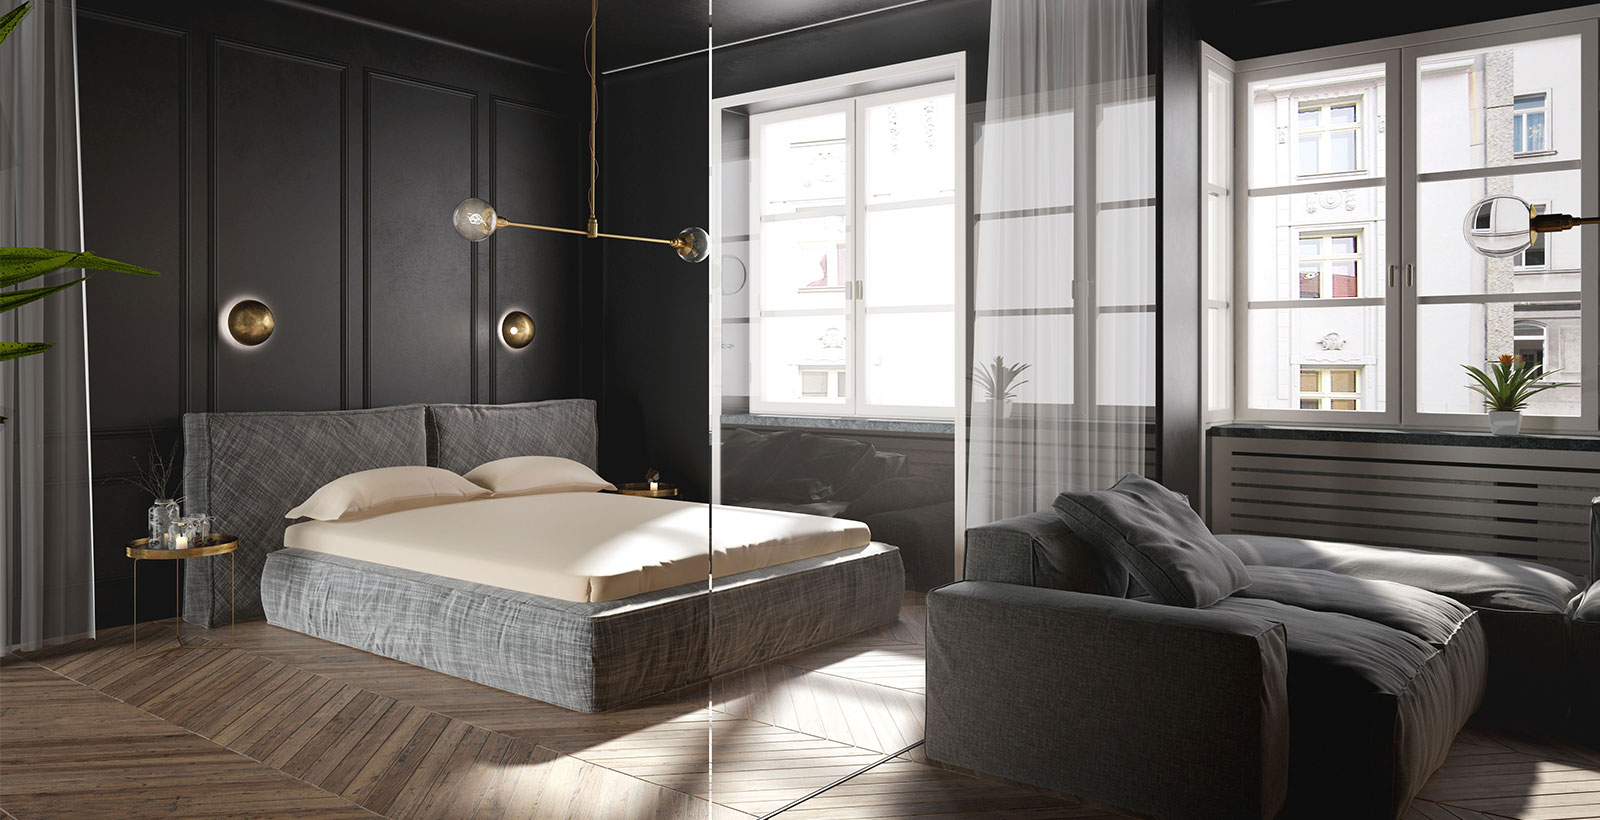 Intérieurs modernes et style glamour | blog Oknoplast